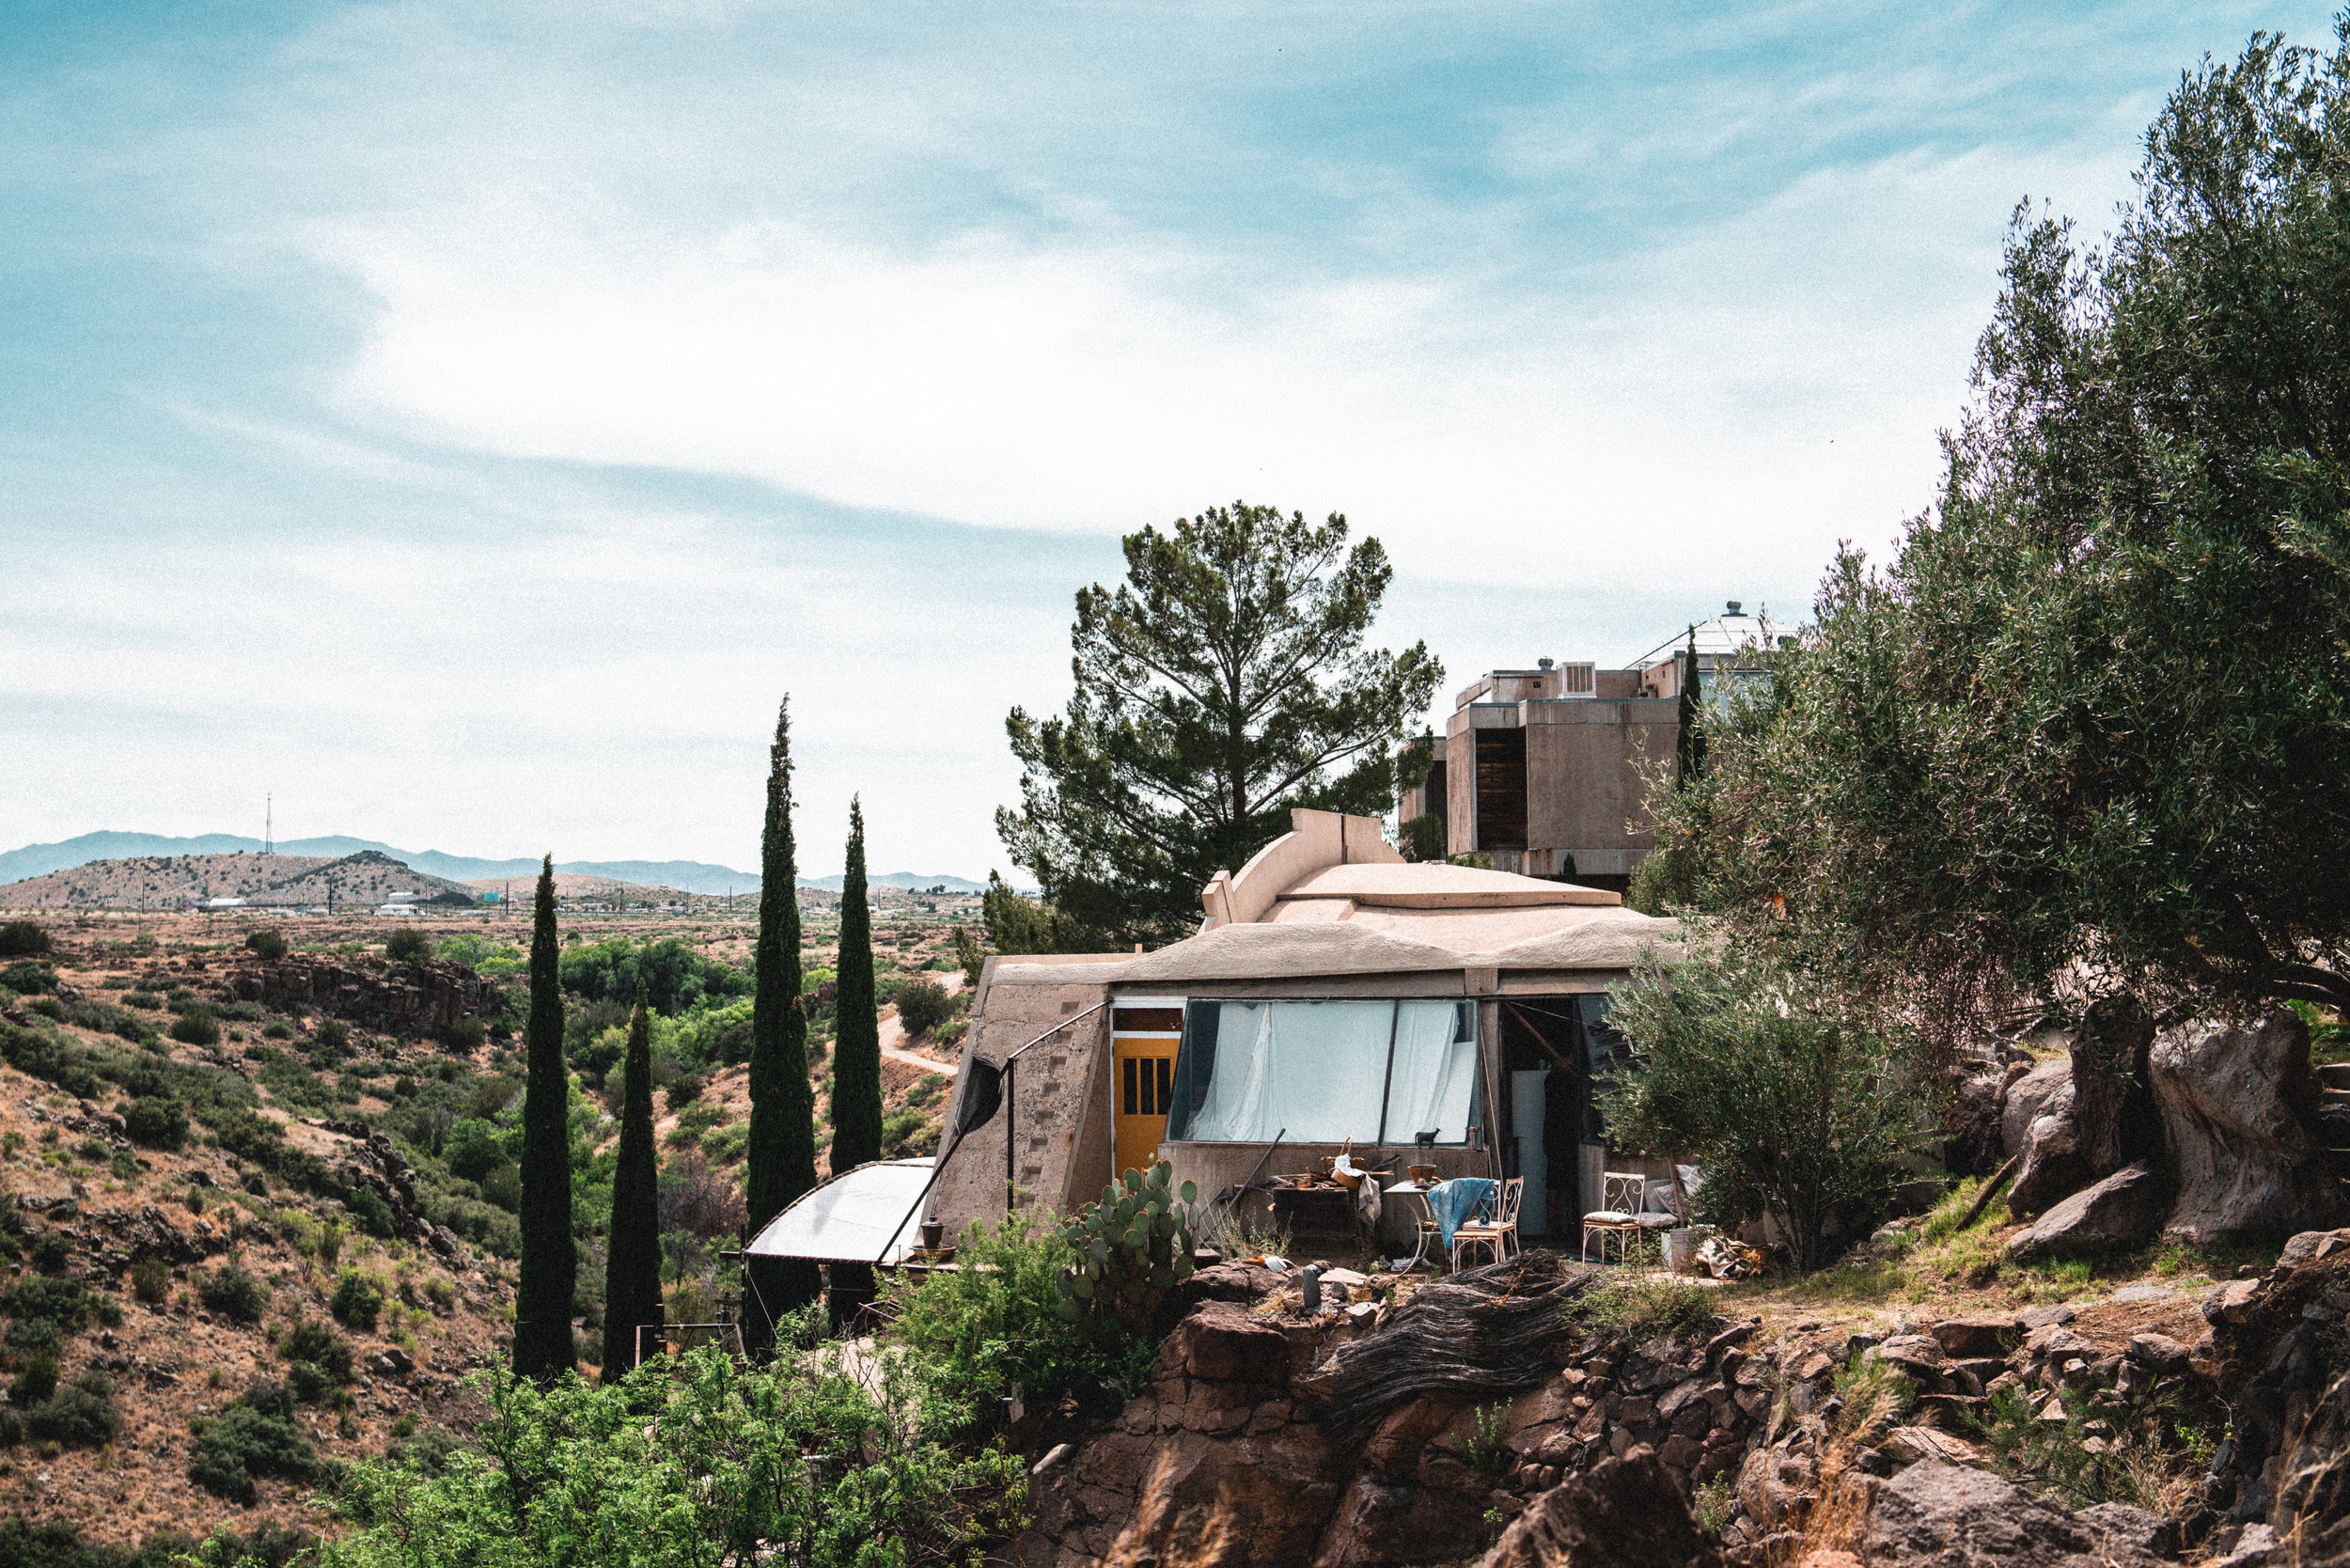 Arizona Mountain Dwellers